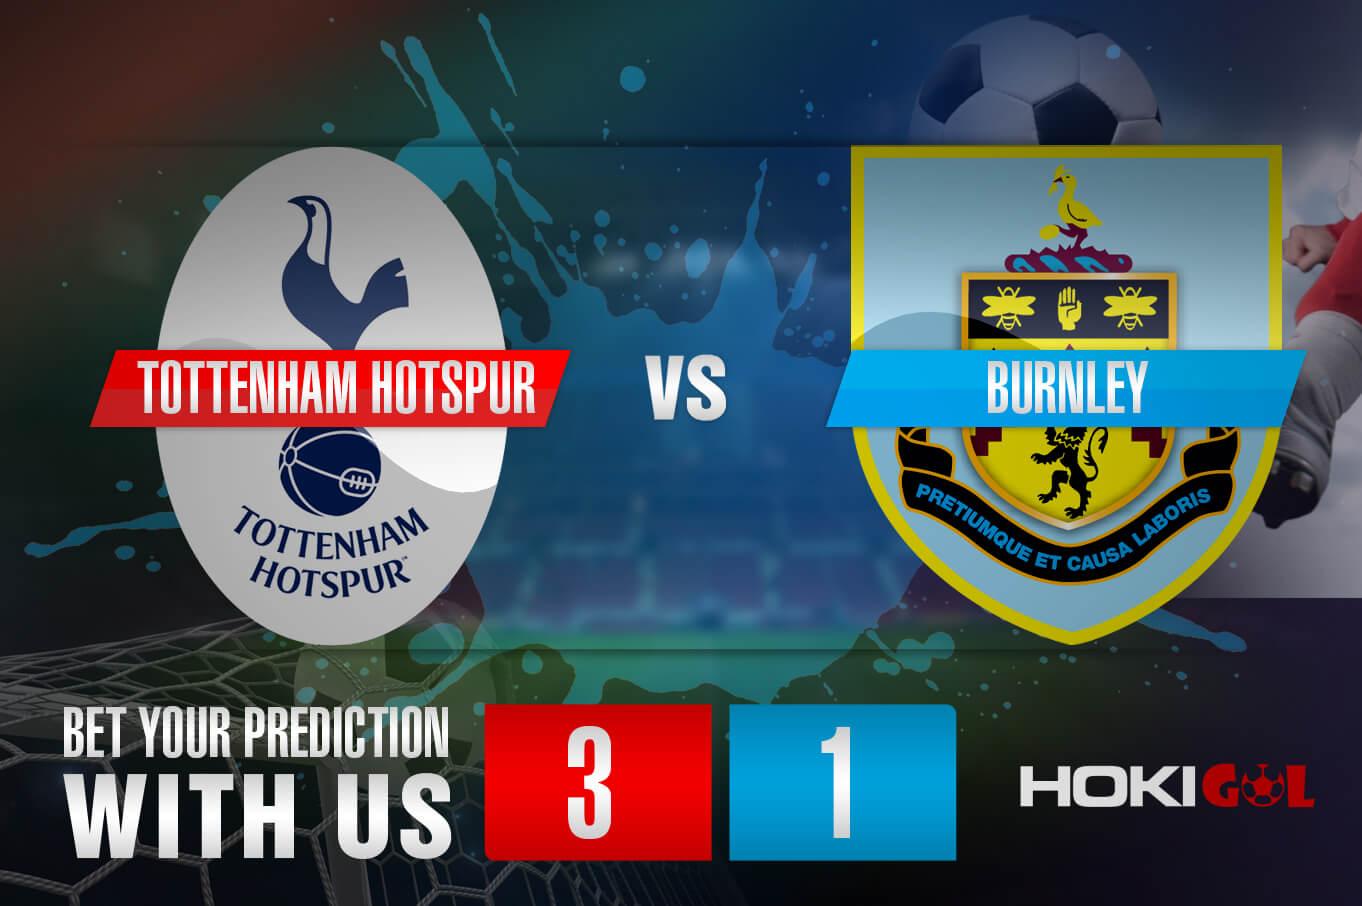 Prediksi Bola Tottenham Hotspur Vs Burnley 29 Agustus 2021